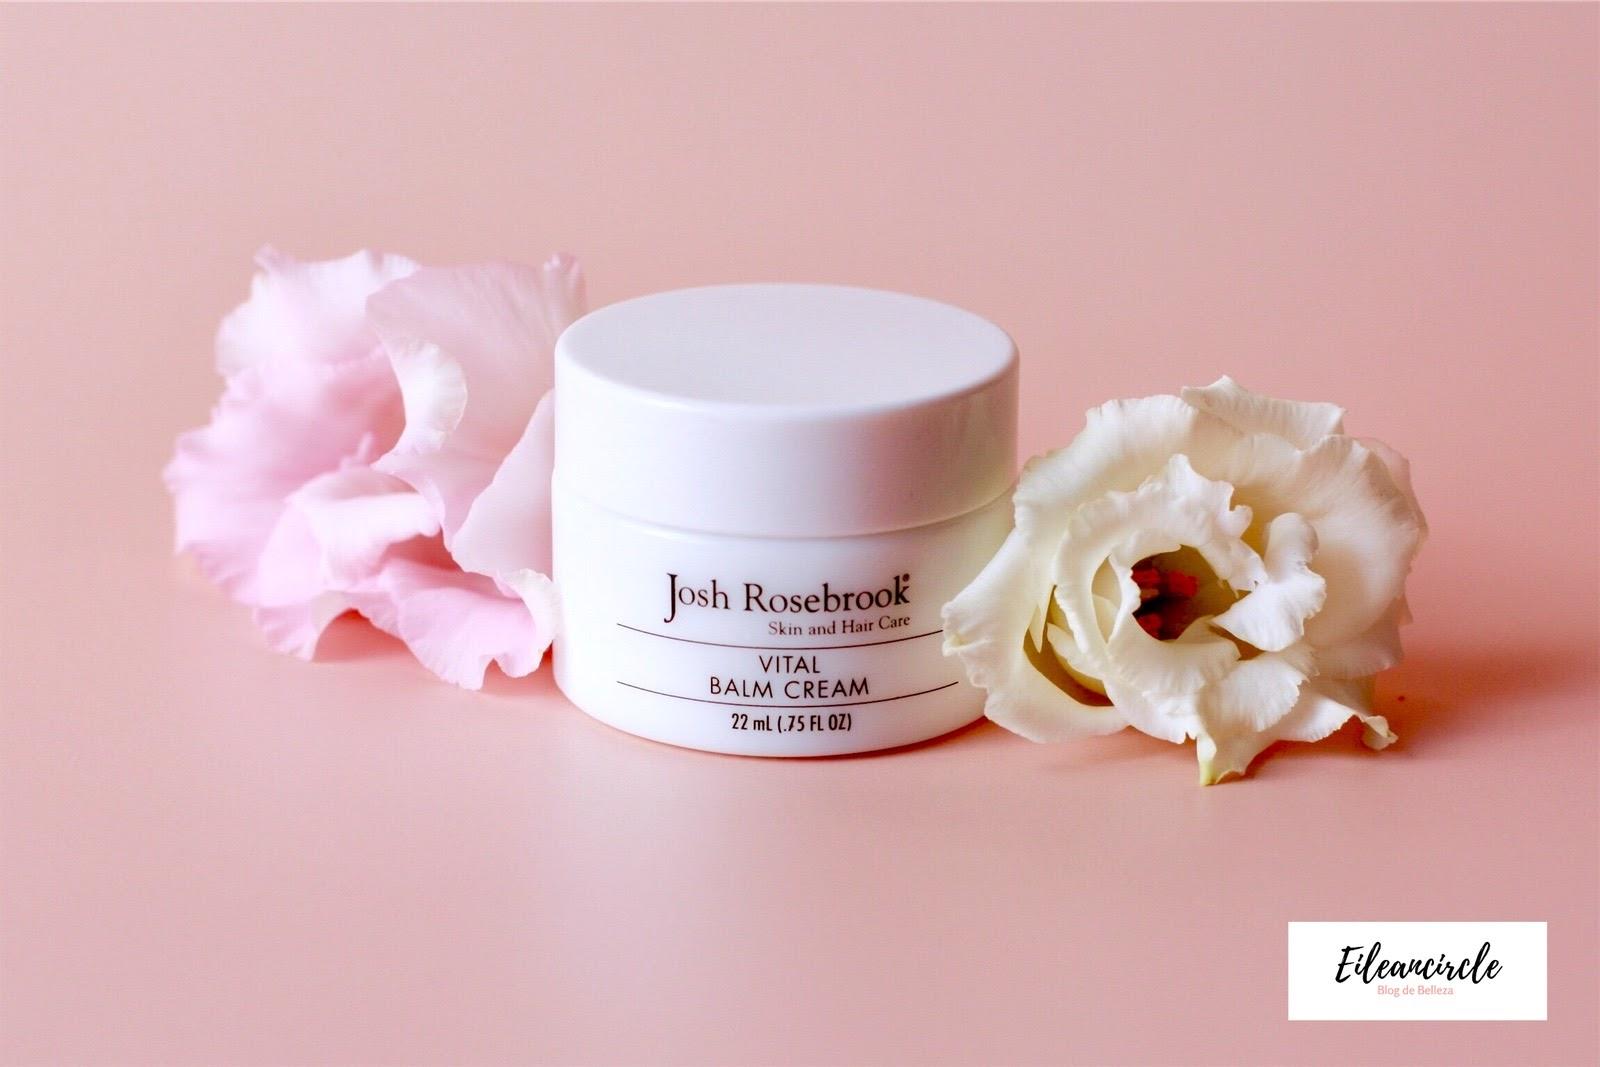 Crema, bálsamo facial, cosmética, cosmética natural, Josh Rosebrook